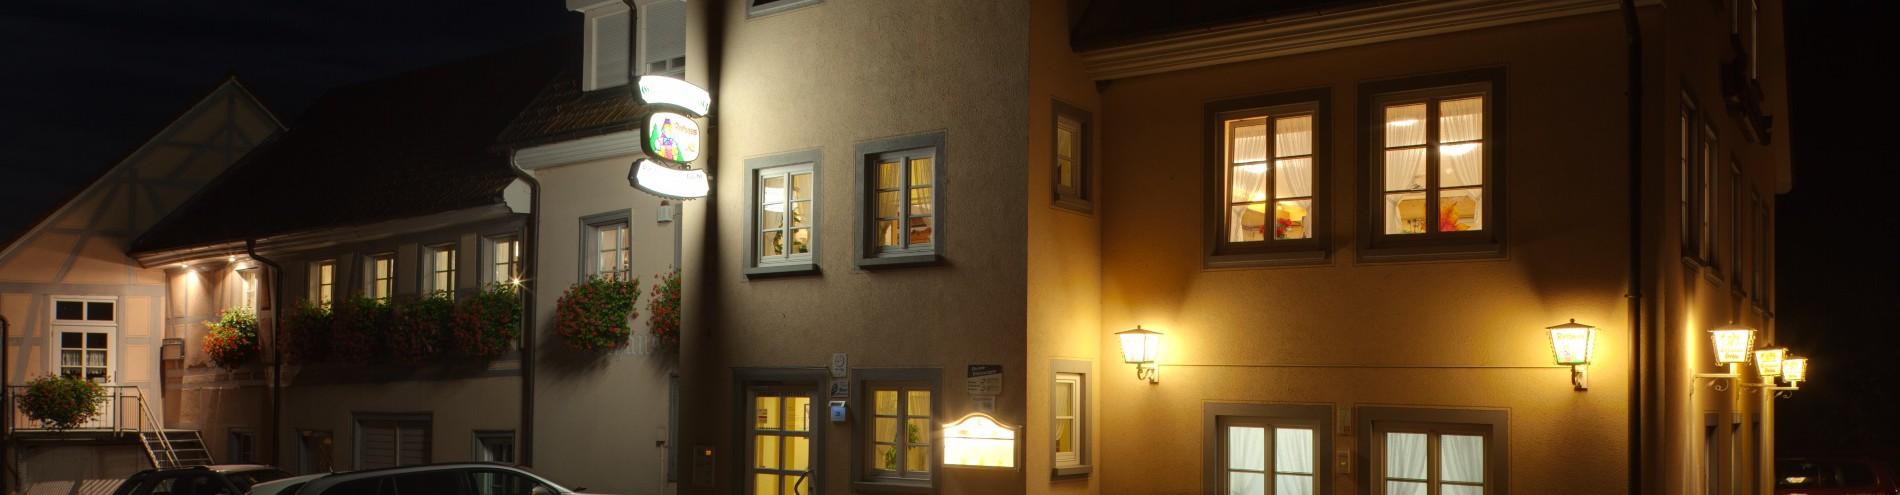 Gasthaus Kranz, 79780 Stühlingen-Lausheim, Familie Kech, Tel. +49 (0)7709 261